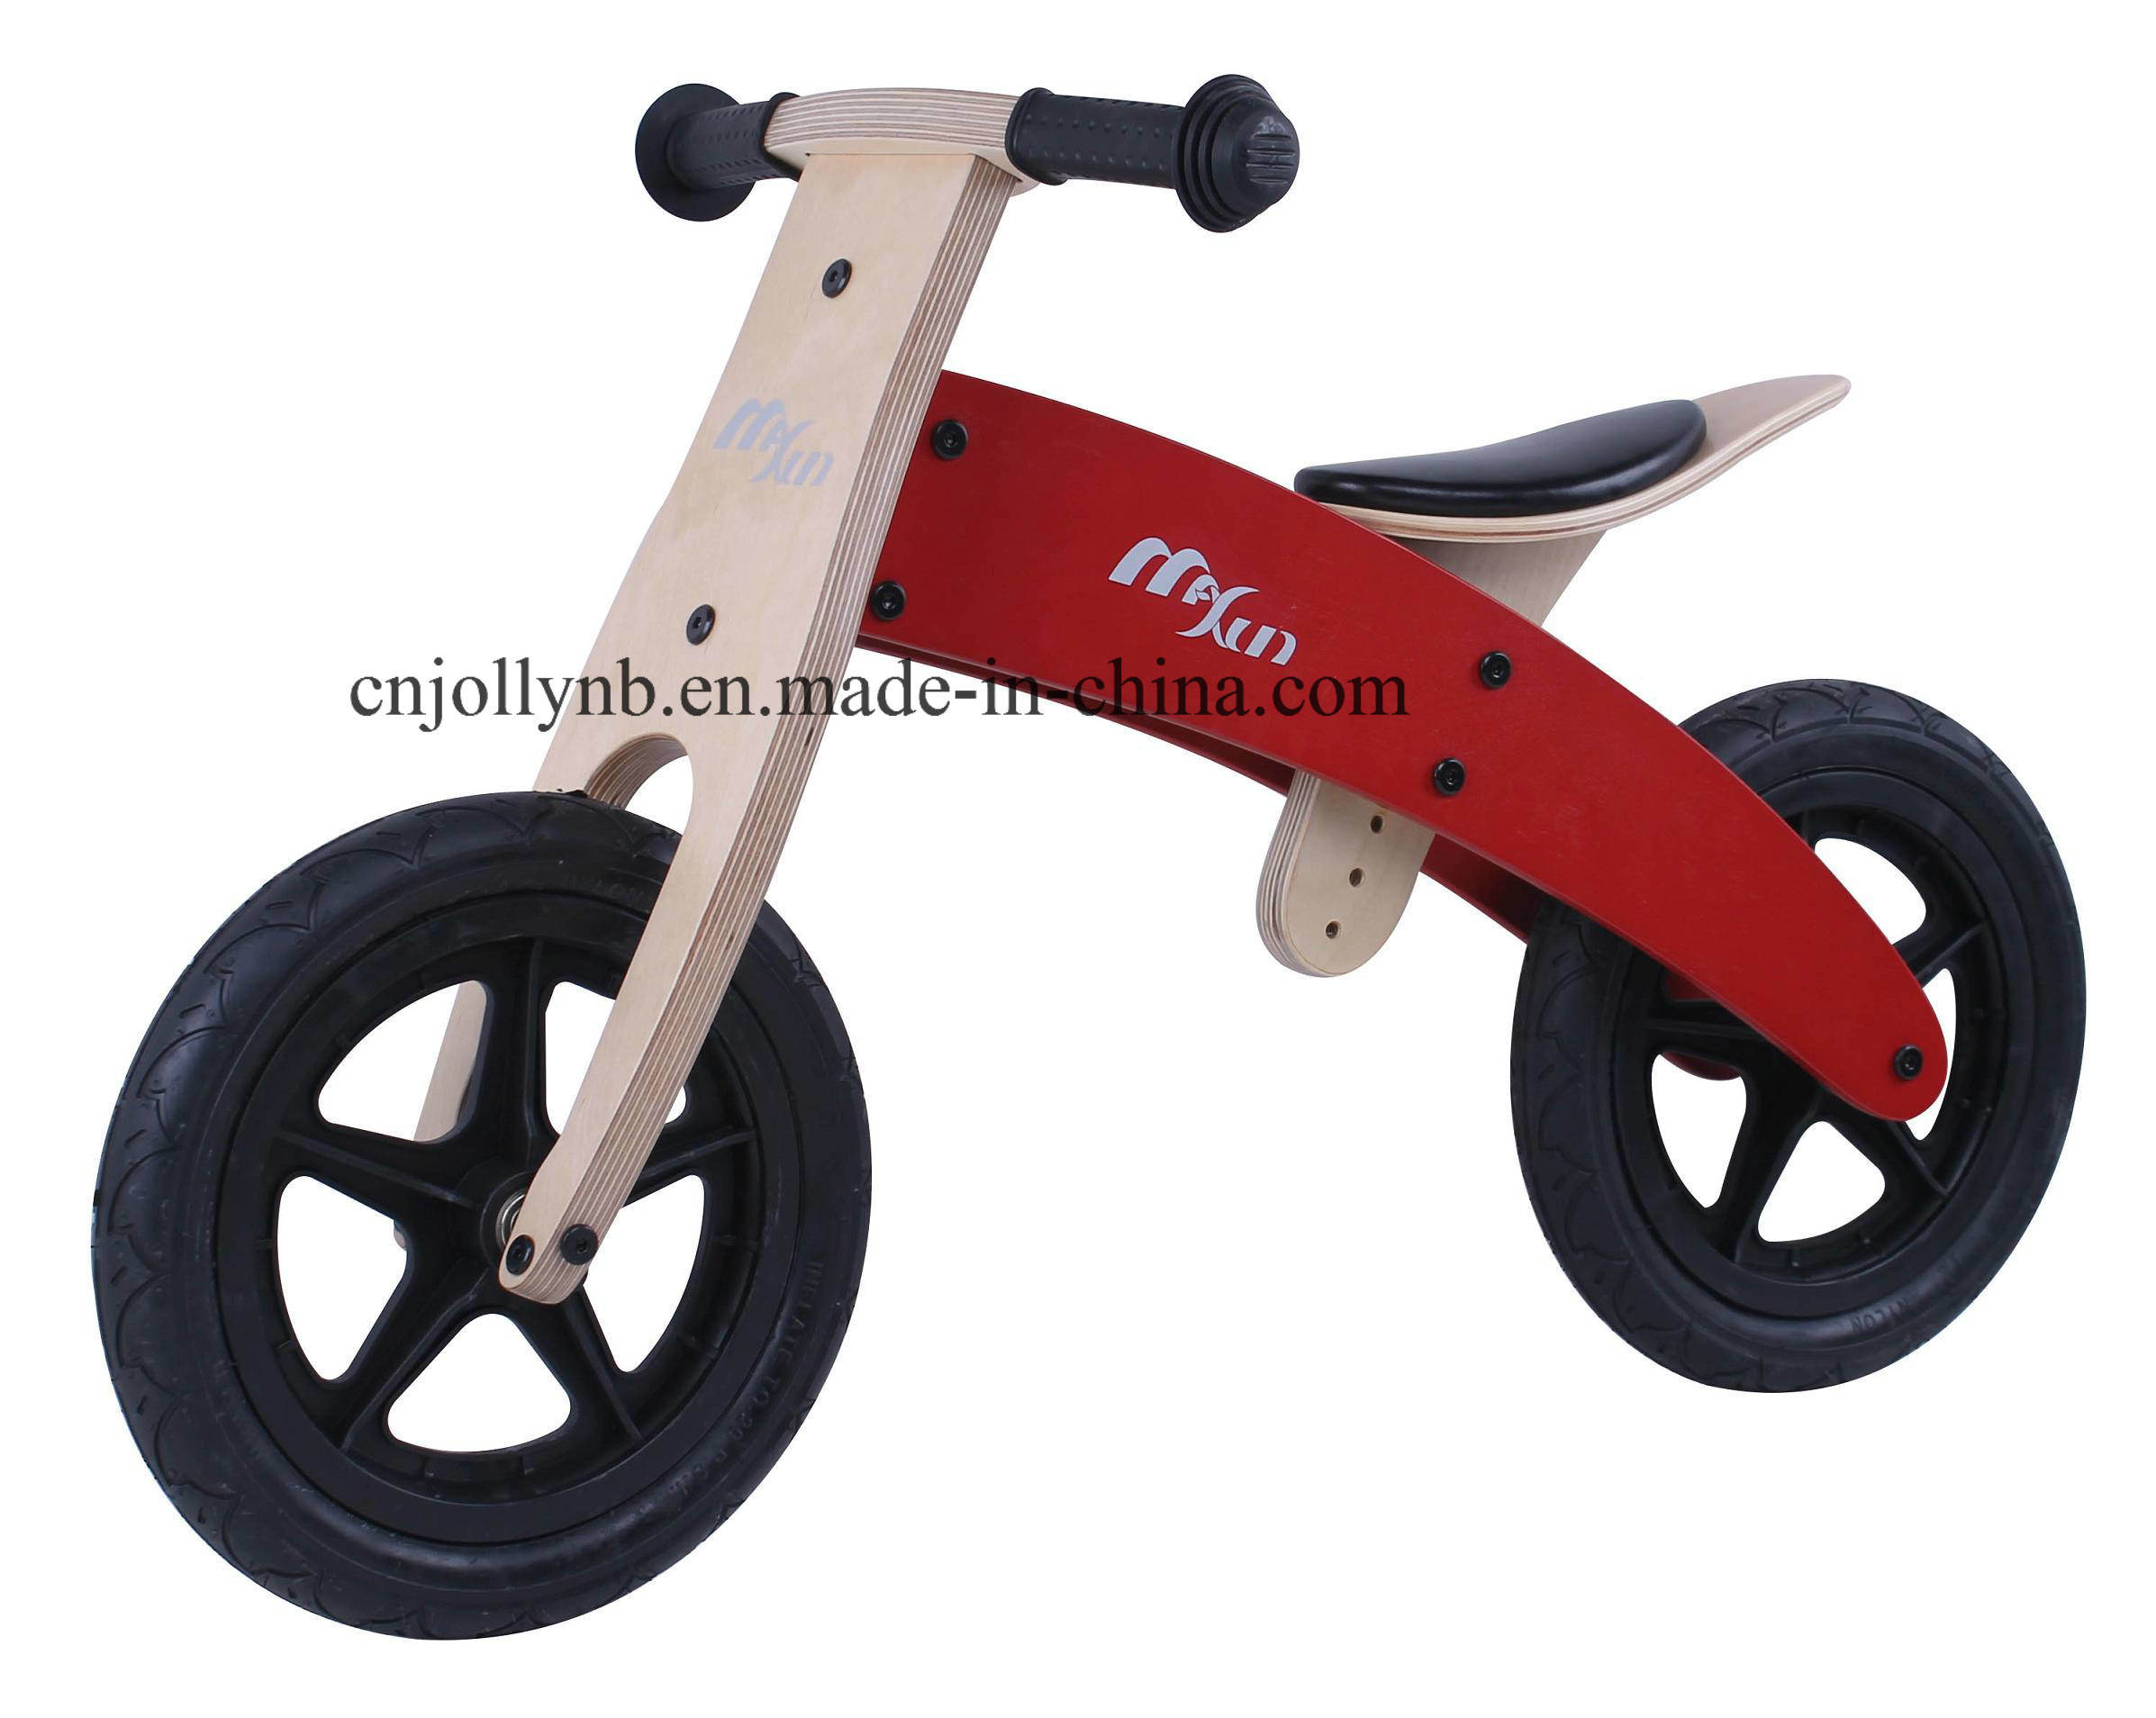 2017 New Hot Sale Wooden Kids Bike Wholesale